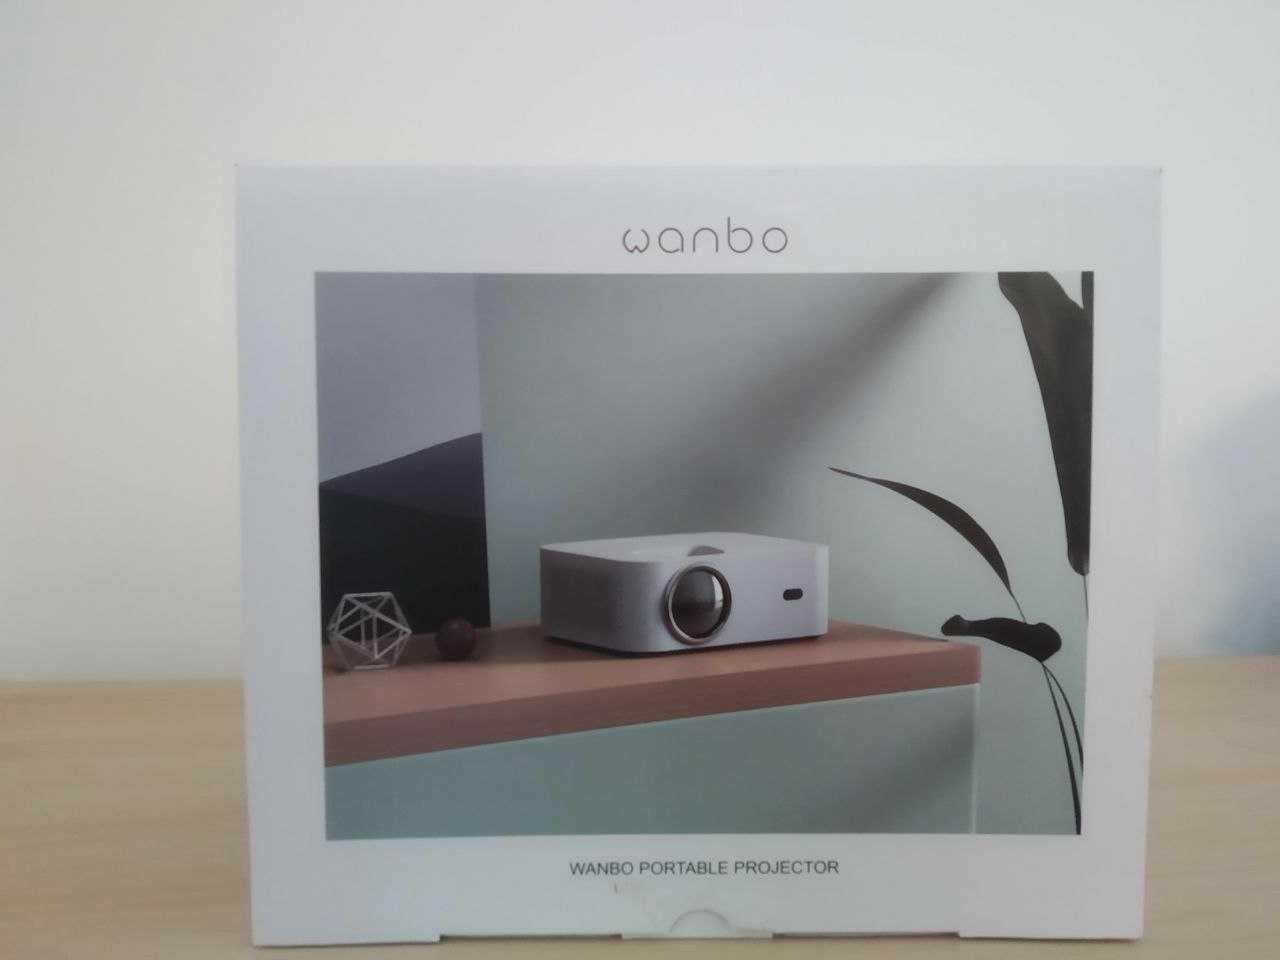 Xiaomi Wanbo X1 review: cheap but effective projector